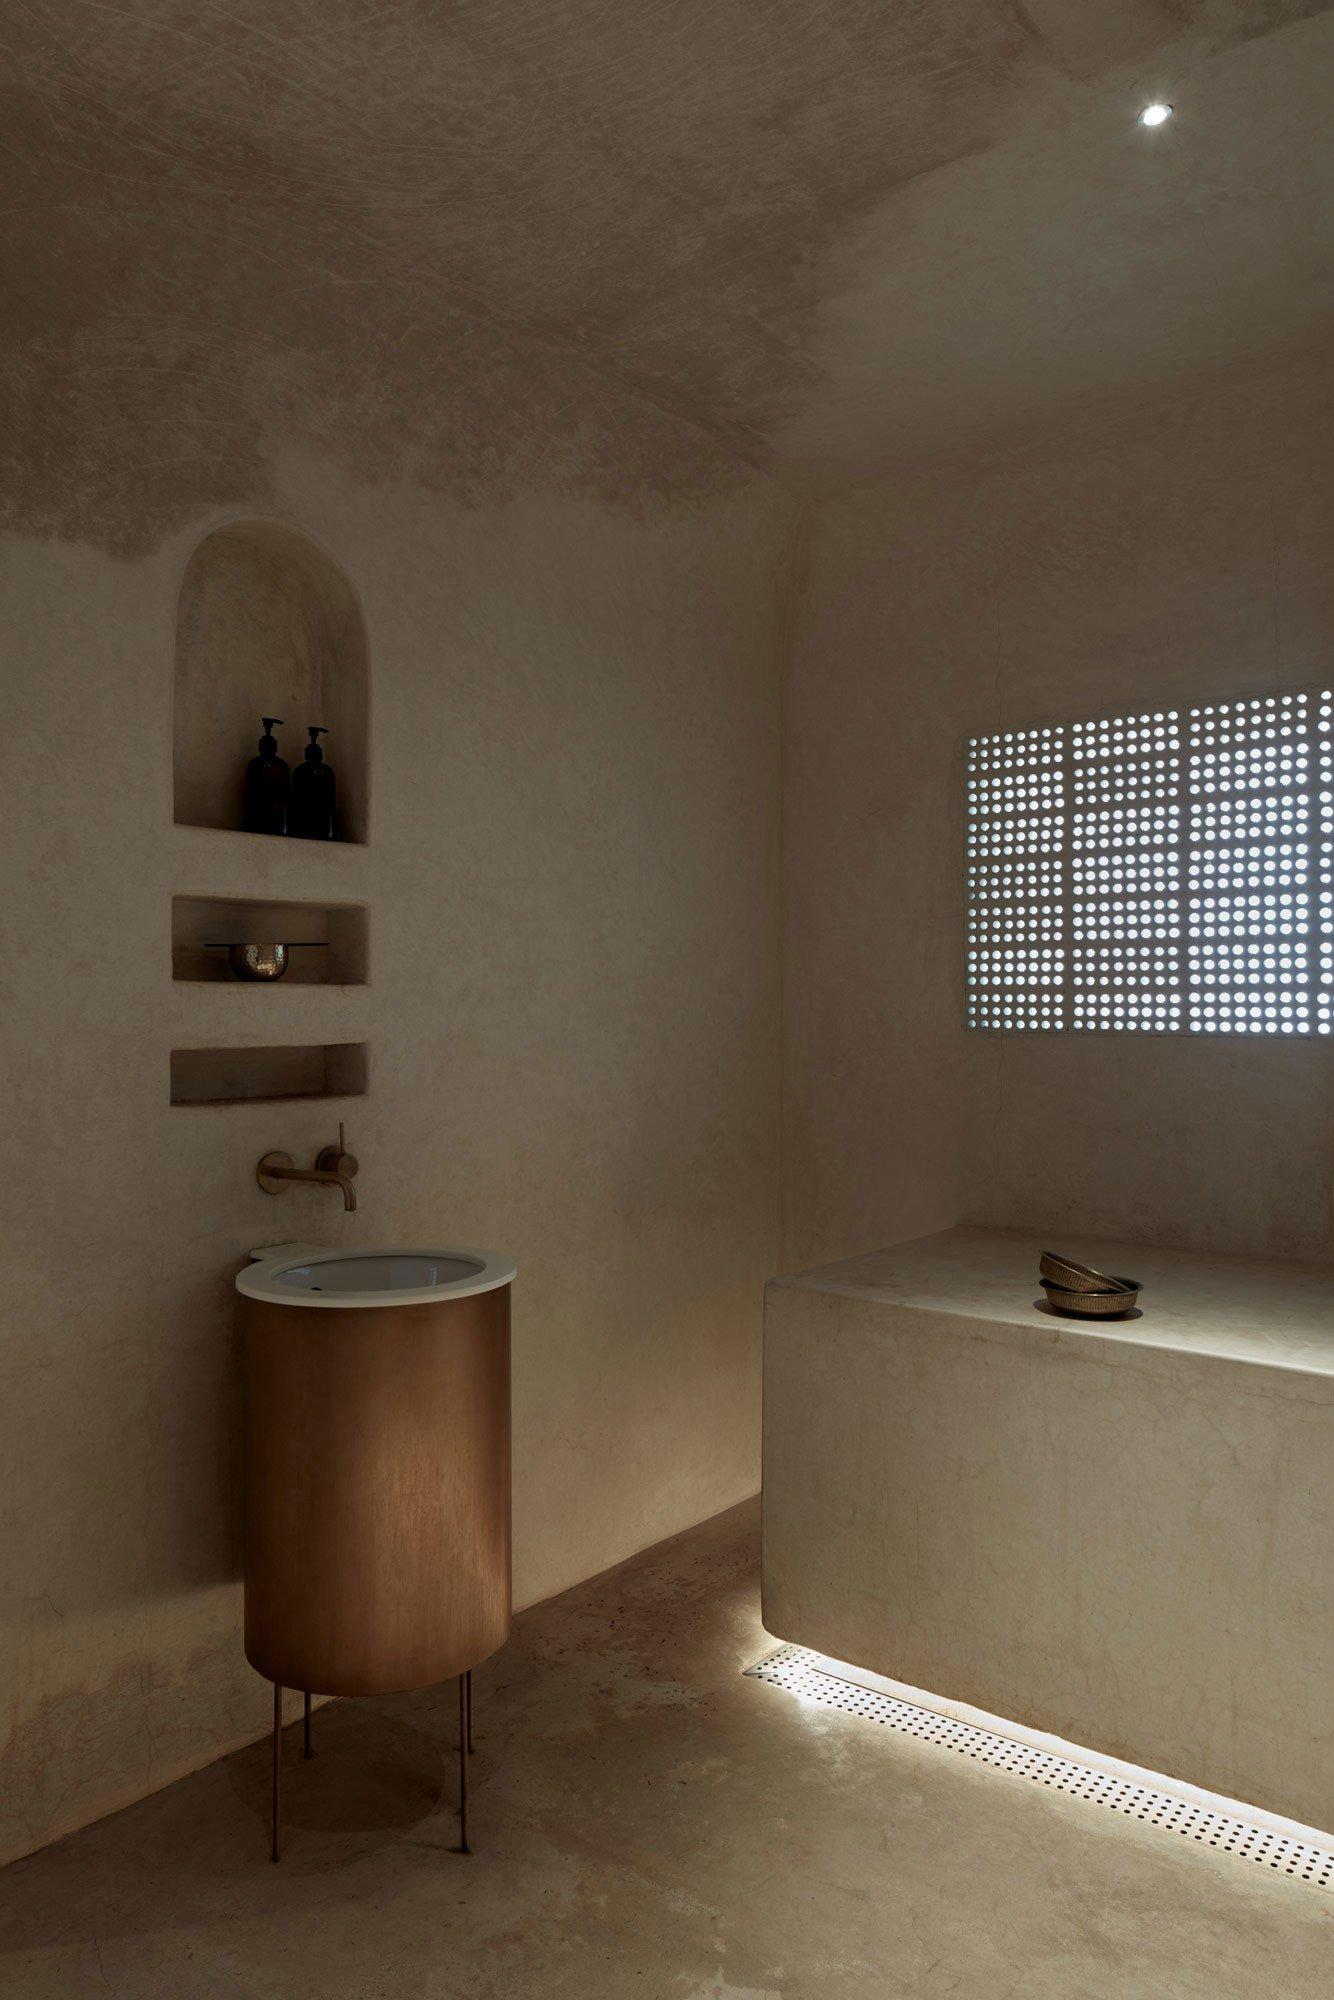 ZAAZ Wellness & Beauty Spa von VSHD Design in Dubai